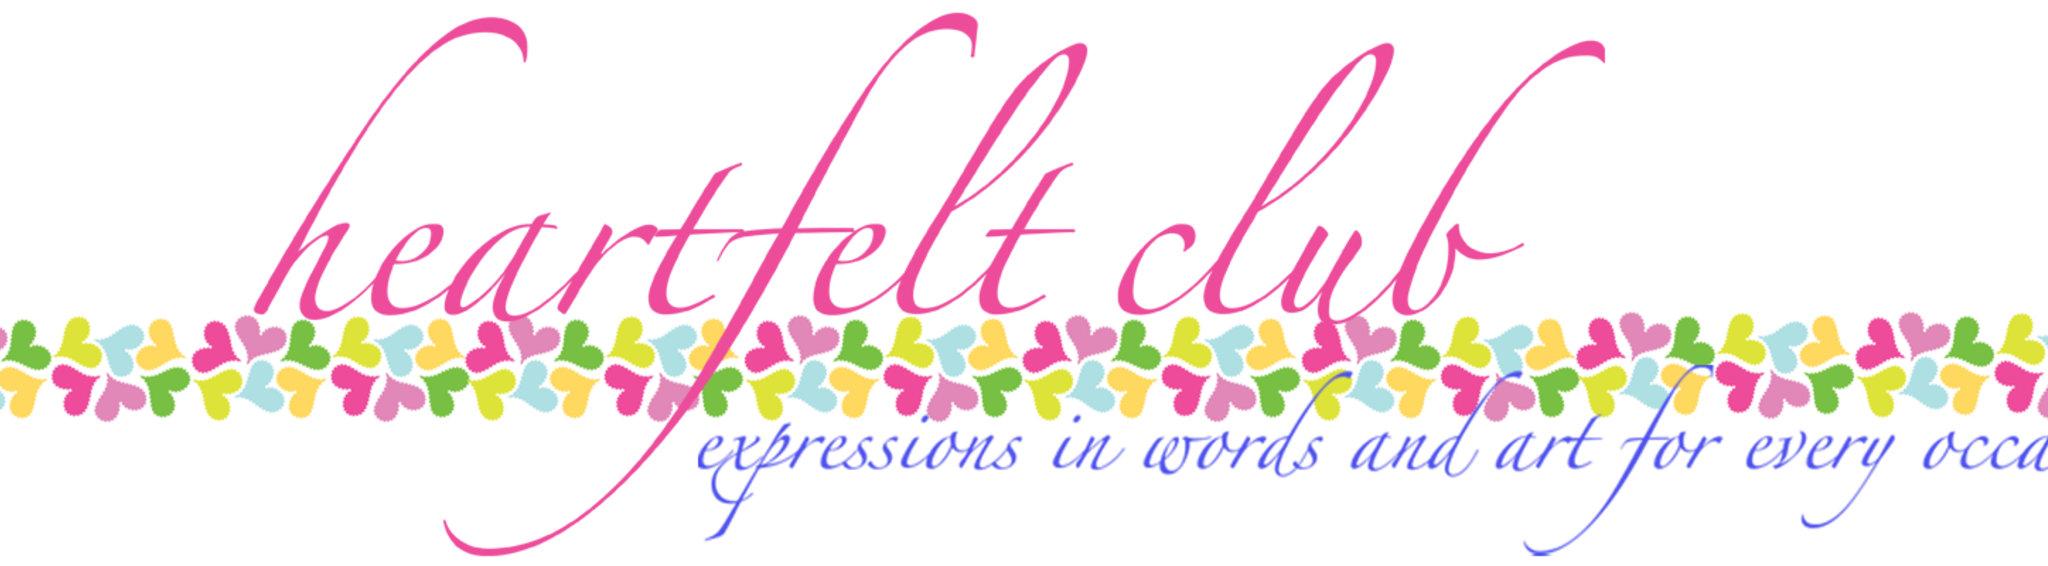 heartfeltclub: Designs & Collections on Zazzle